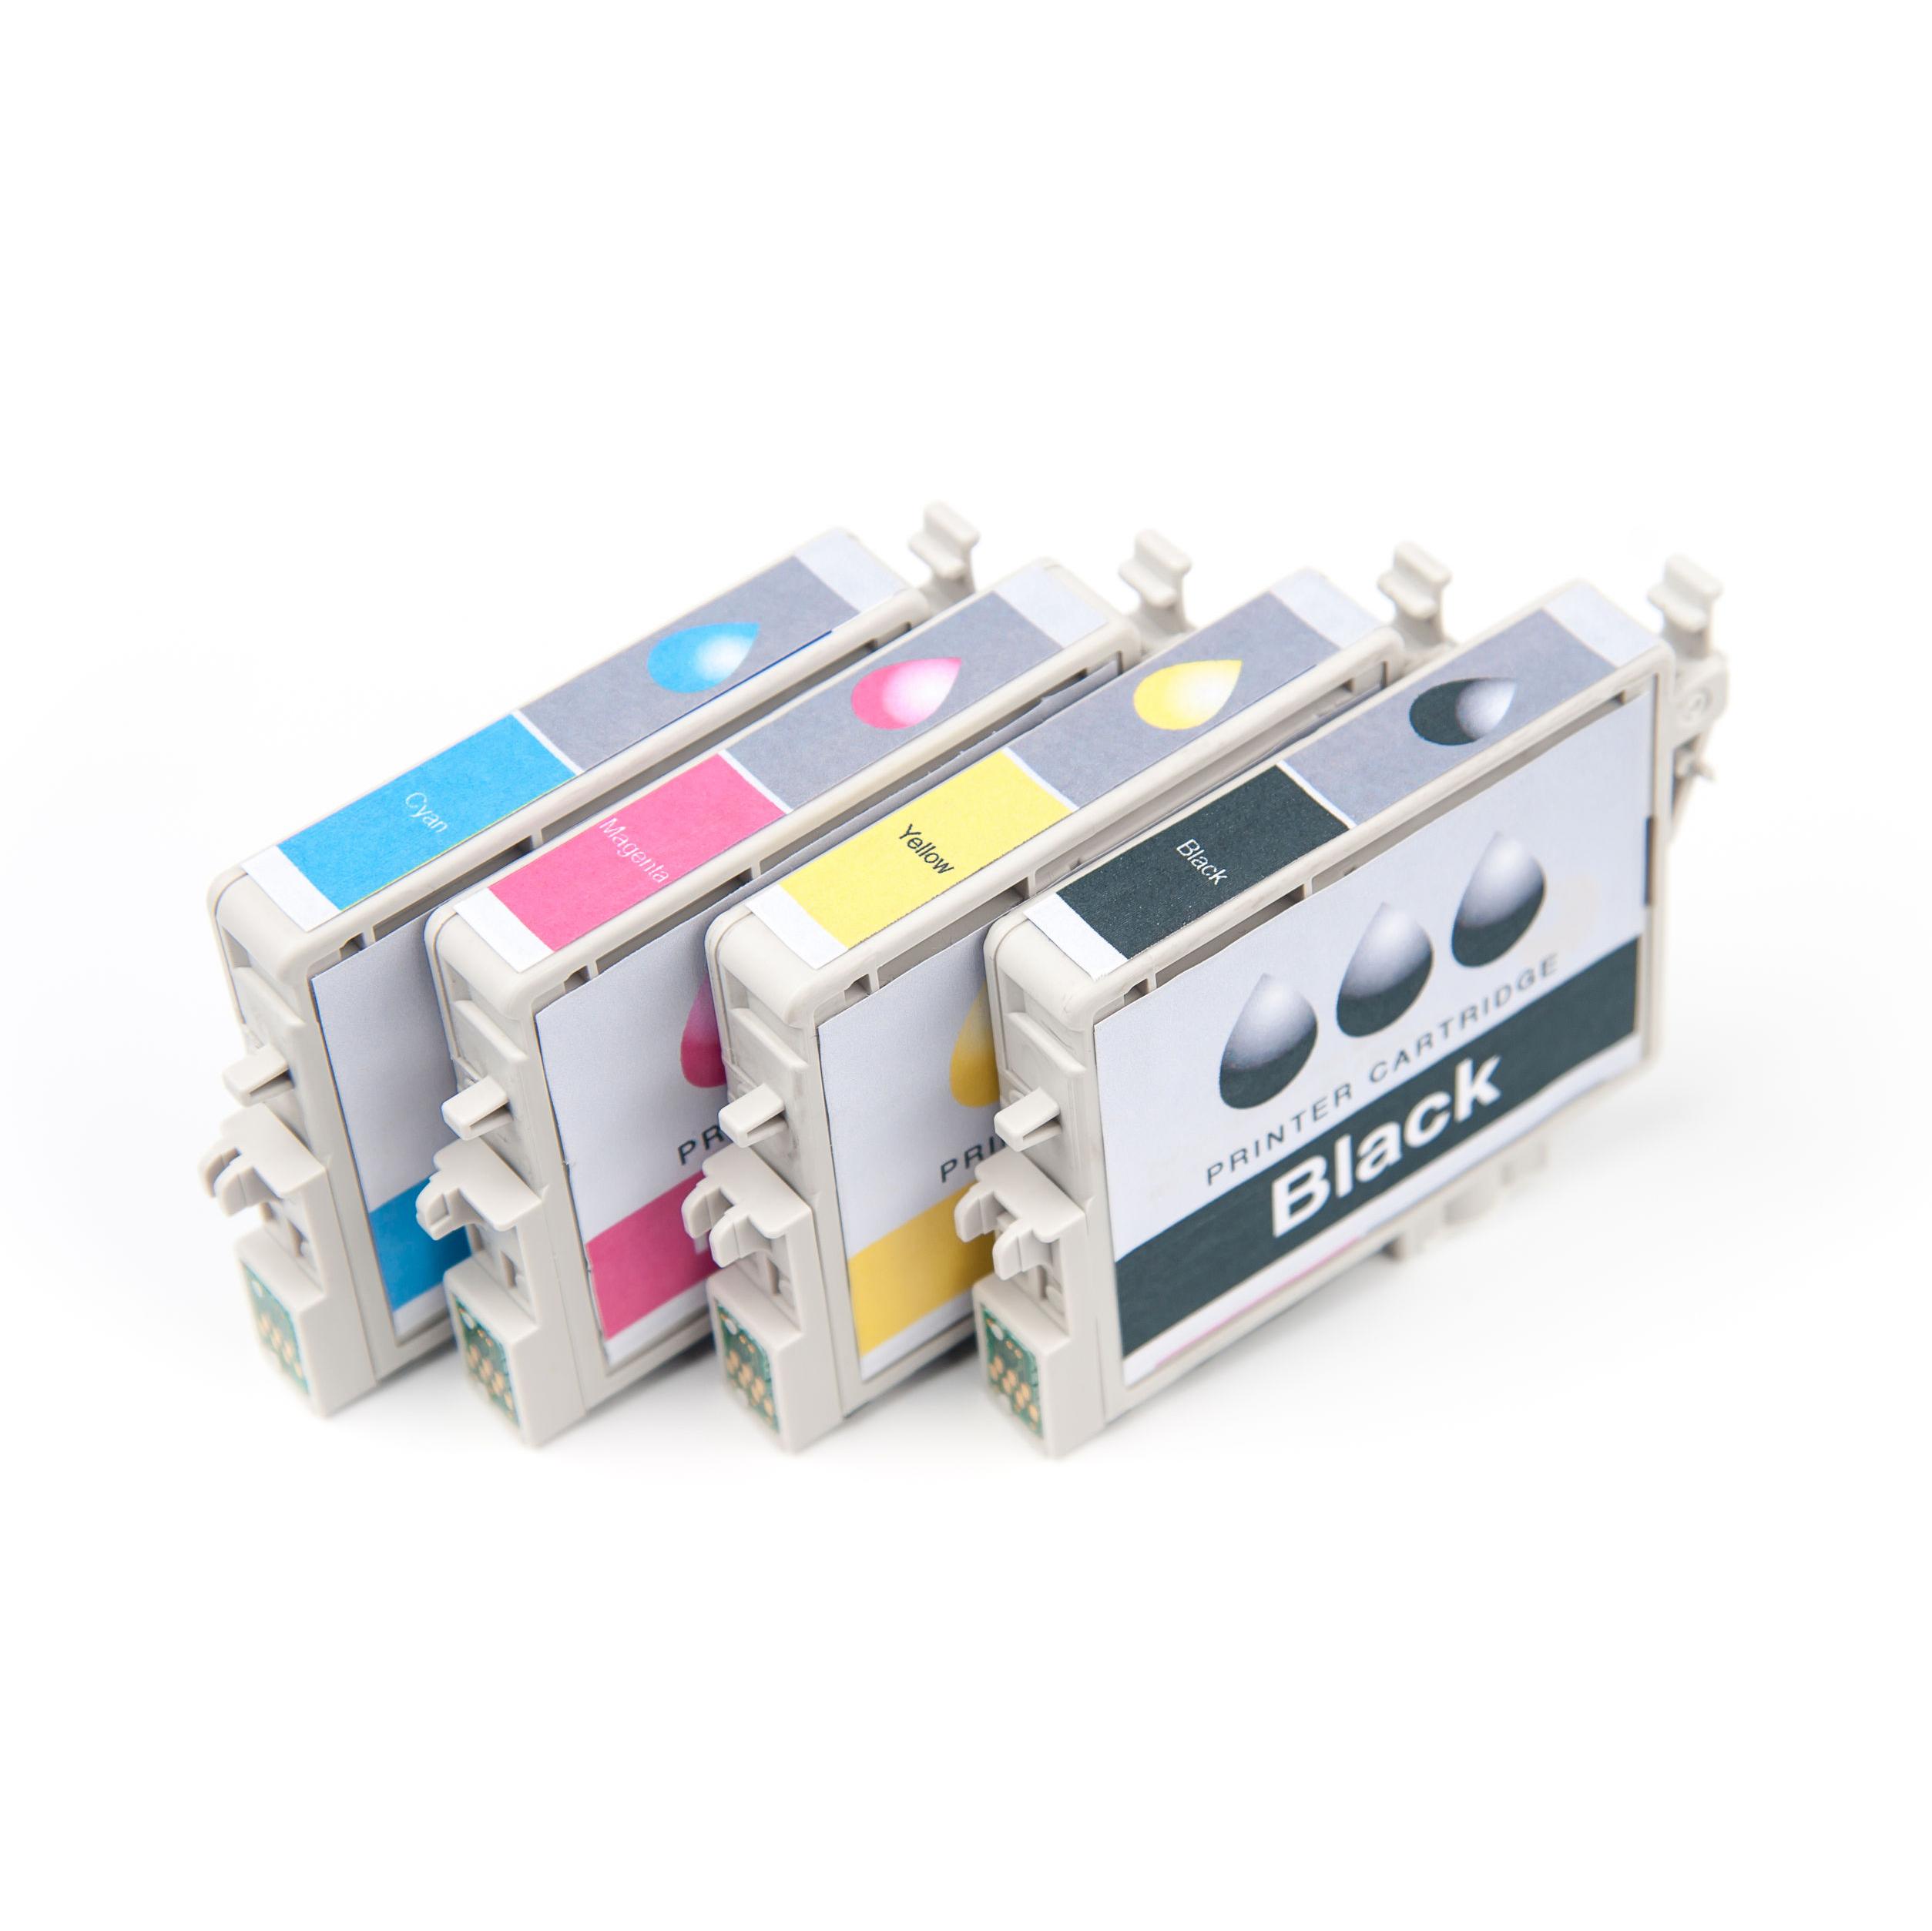 Originale HP Q7966EE#301 / 363 Cartuccia di inchiostro multi pack